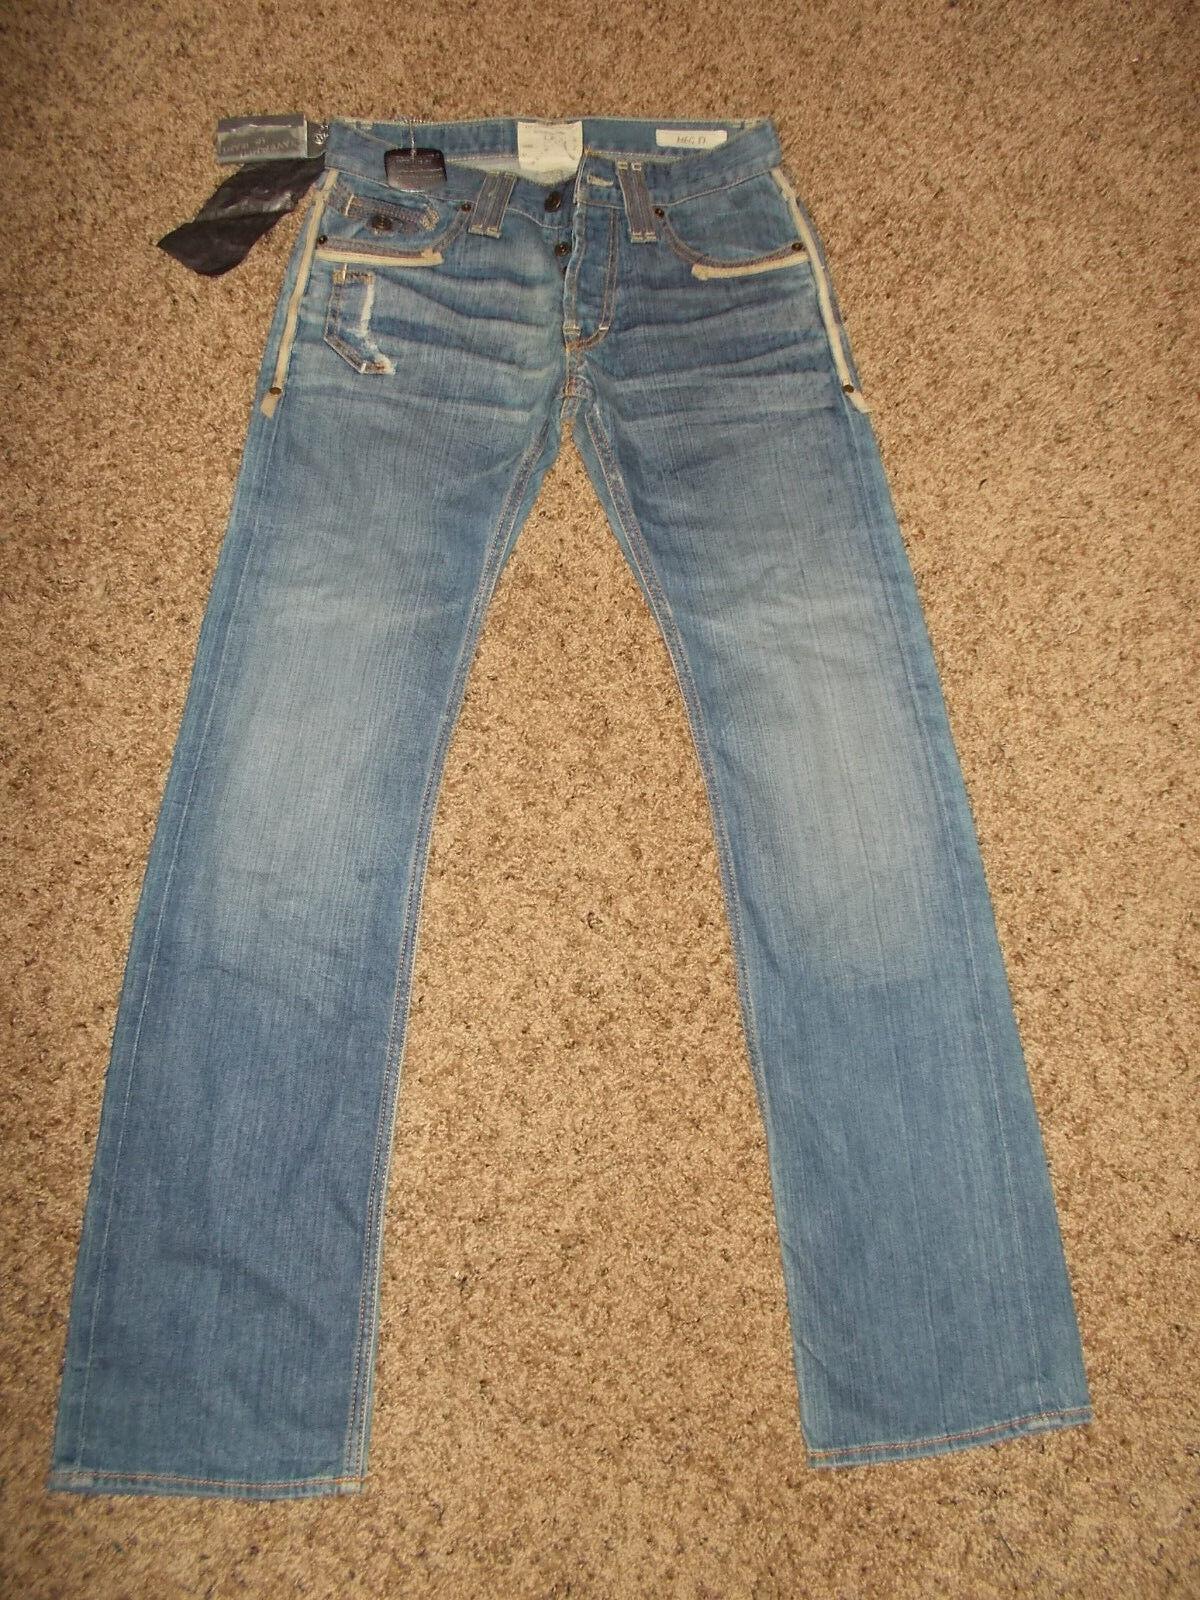 NWT  120.00 Jimmy Taverniti MEG 17 Denim Jeans 29x32 Women's Straight Leg sku2